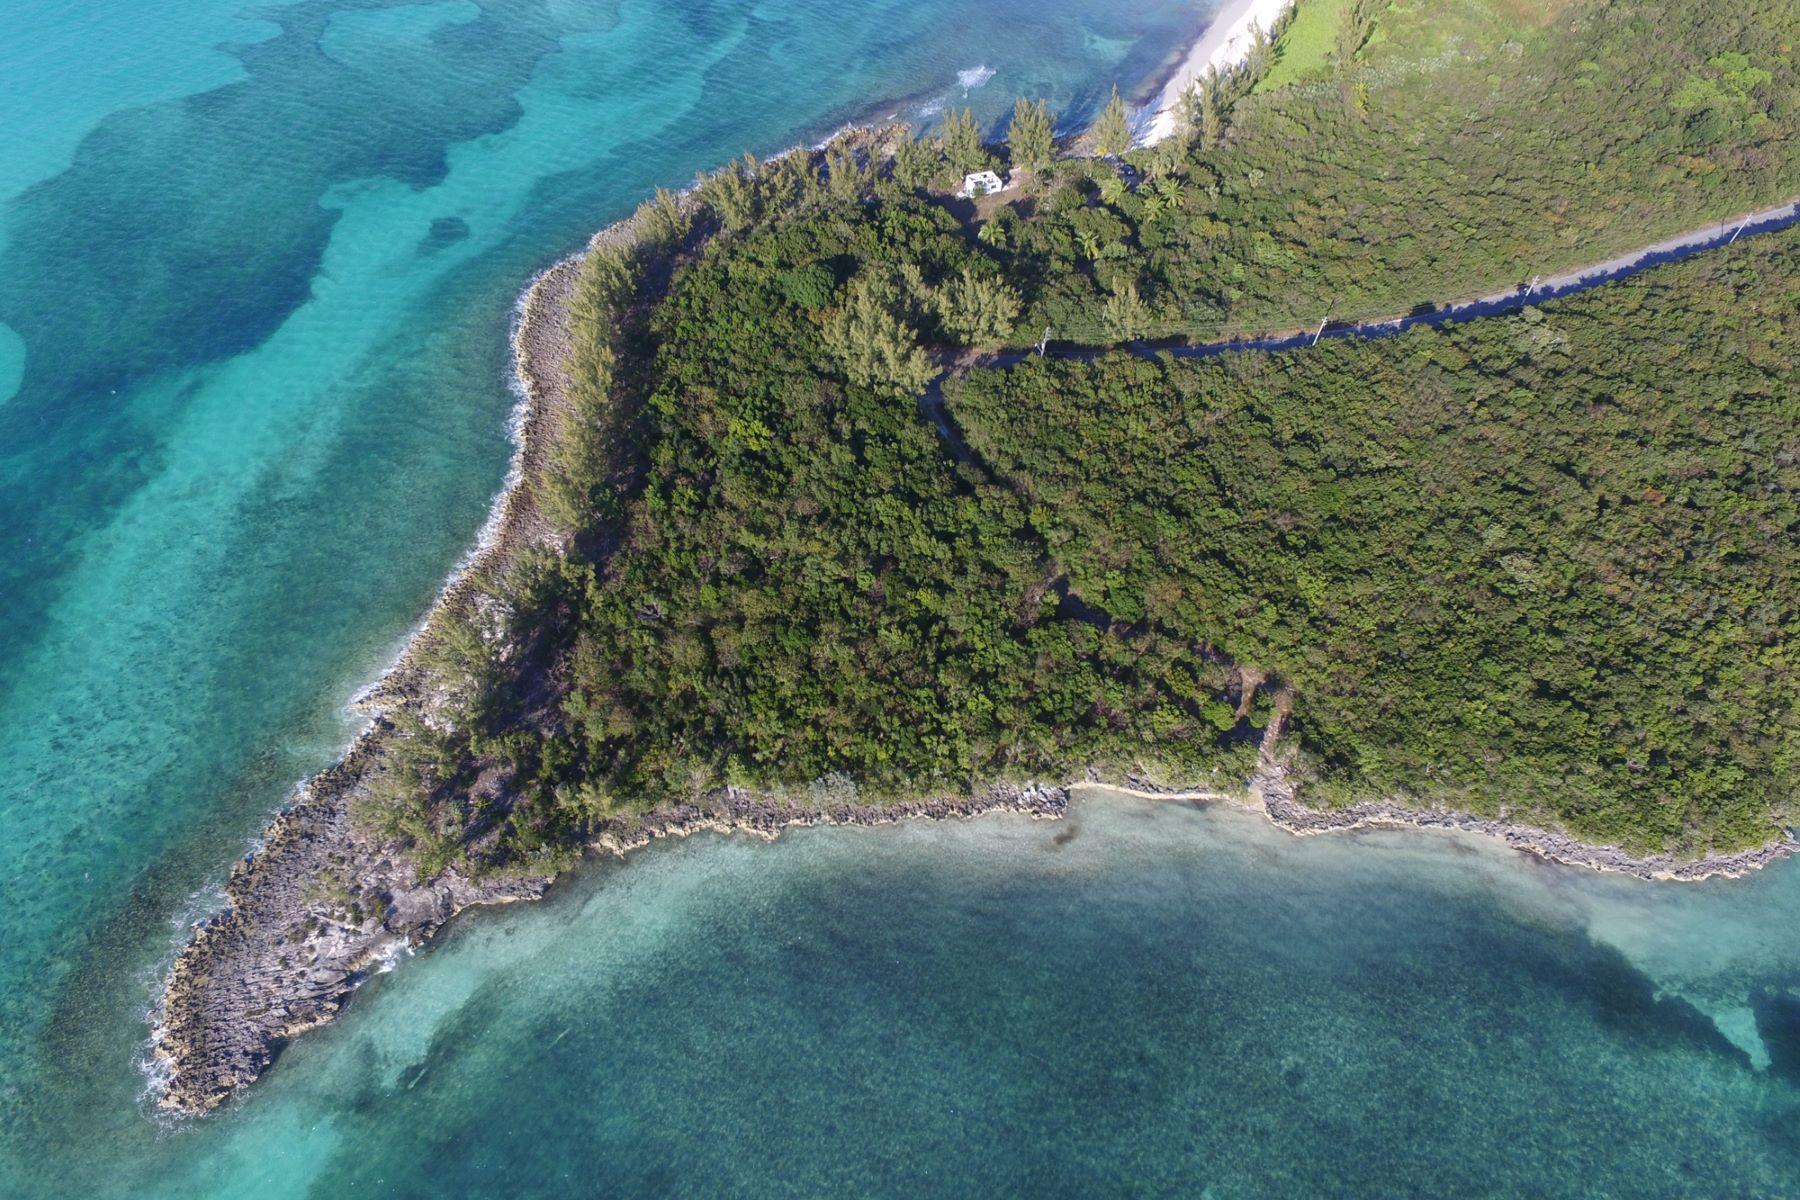 Terreno para Venda às Lot J - Sunset Point Russell Island, Spanish Wells, Eleuteria Bahamas